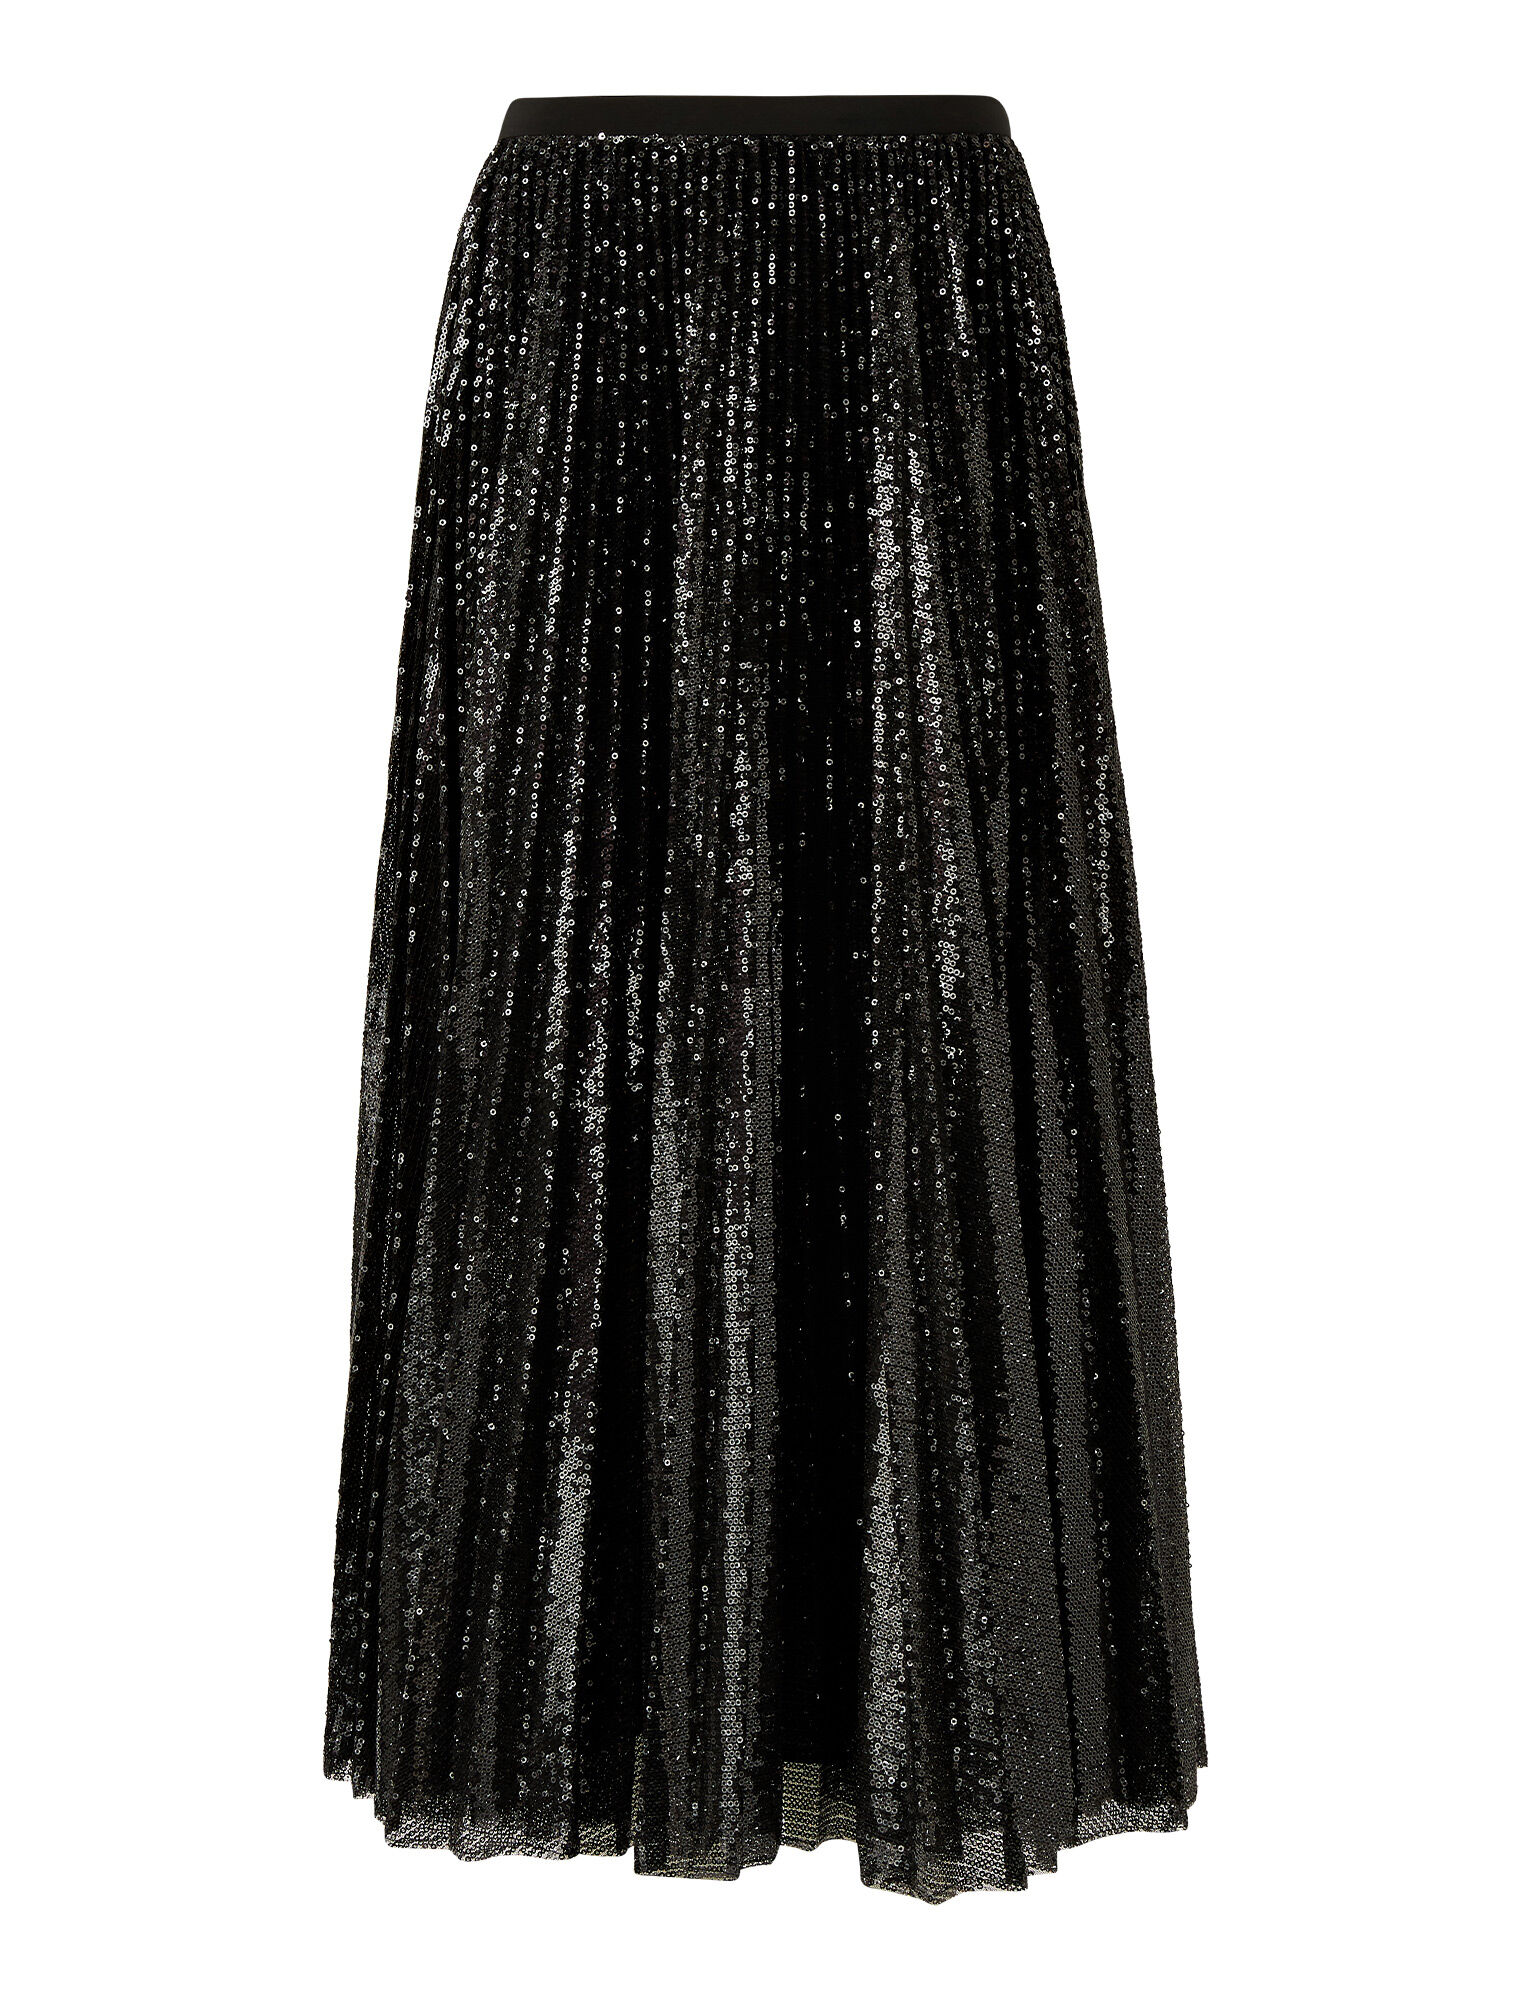 Joseph, Pleated Sequins Sparkle Skirt, in BLACK